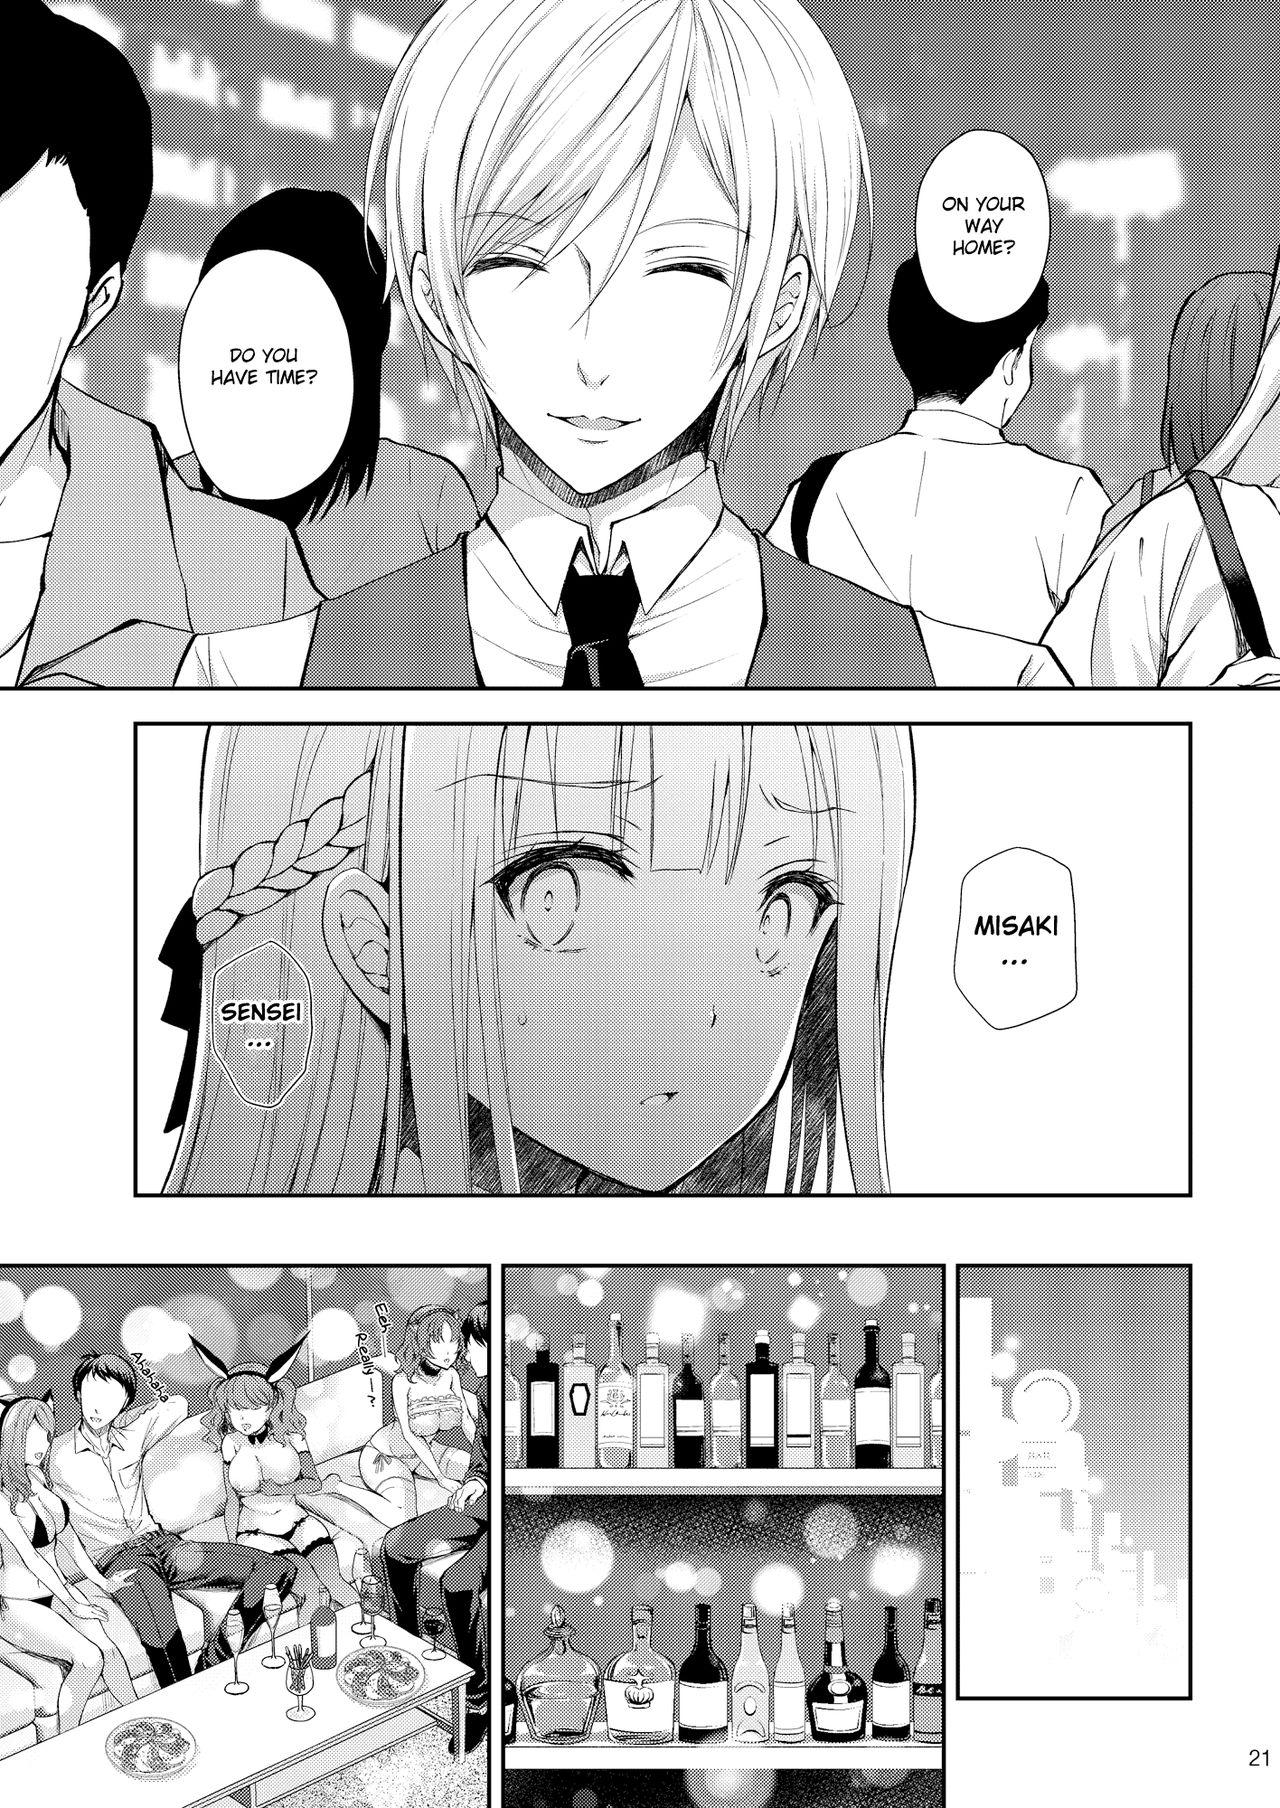 (C96) [Sugar*Berry*Syrup (Crowe)] Indeki no Reijou 3 ~Yureugoku Kokoro, Yoru Midareru Mitsubana~ | Obscene Lady 3 - ~Wavering heart, Astrayed Evening Nectar~ [English] [obsoletezero] 20